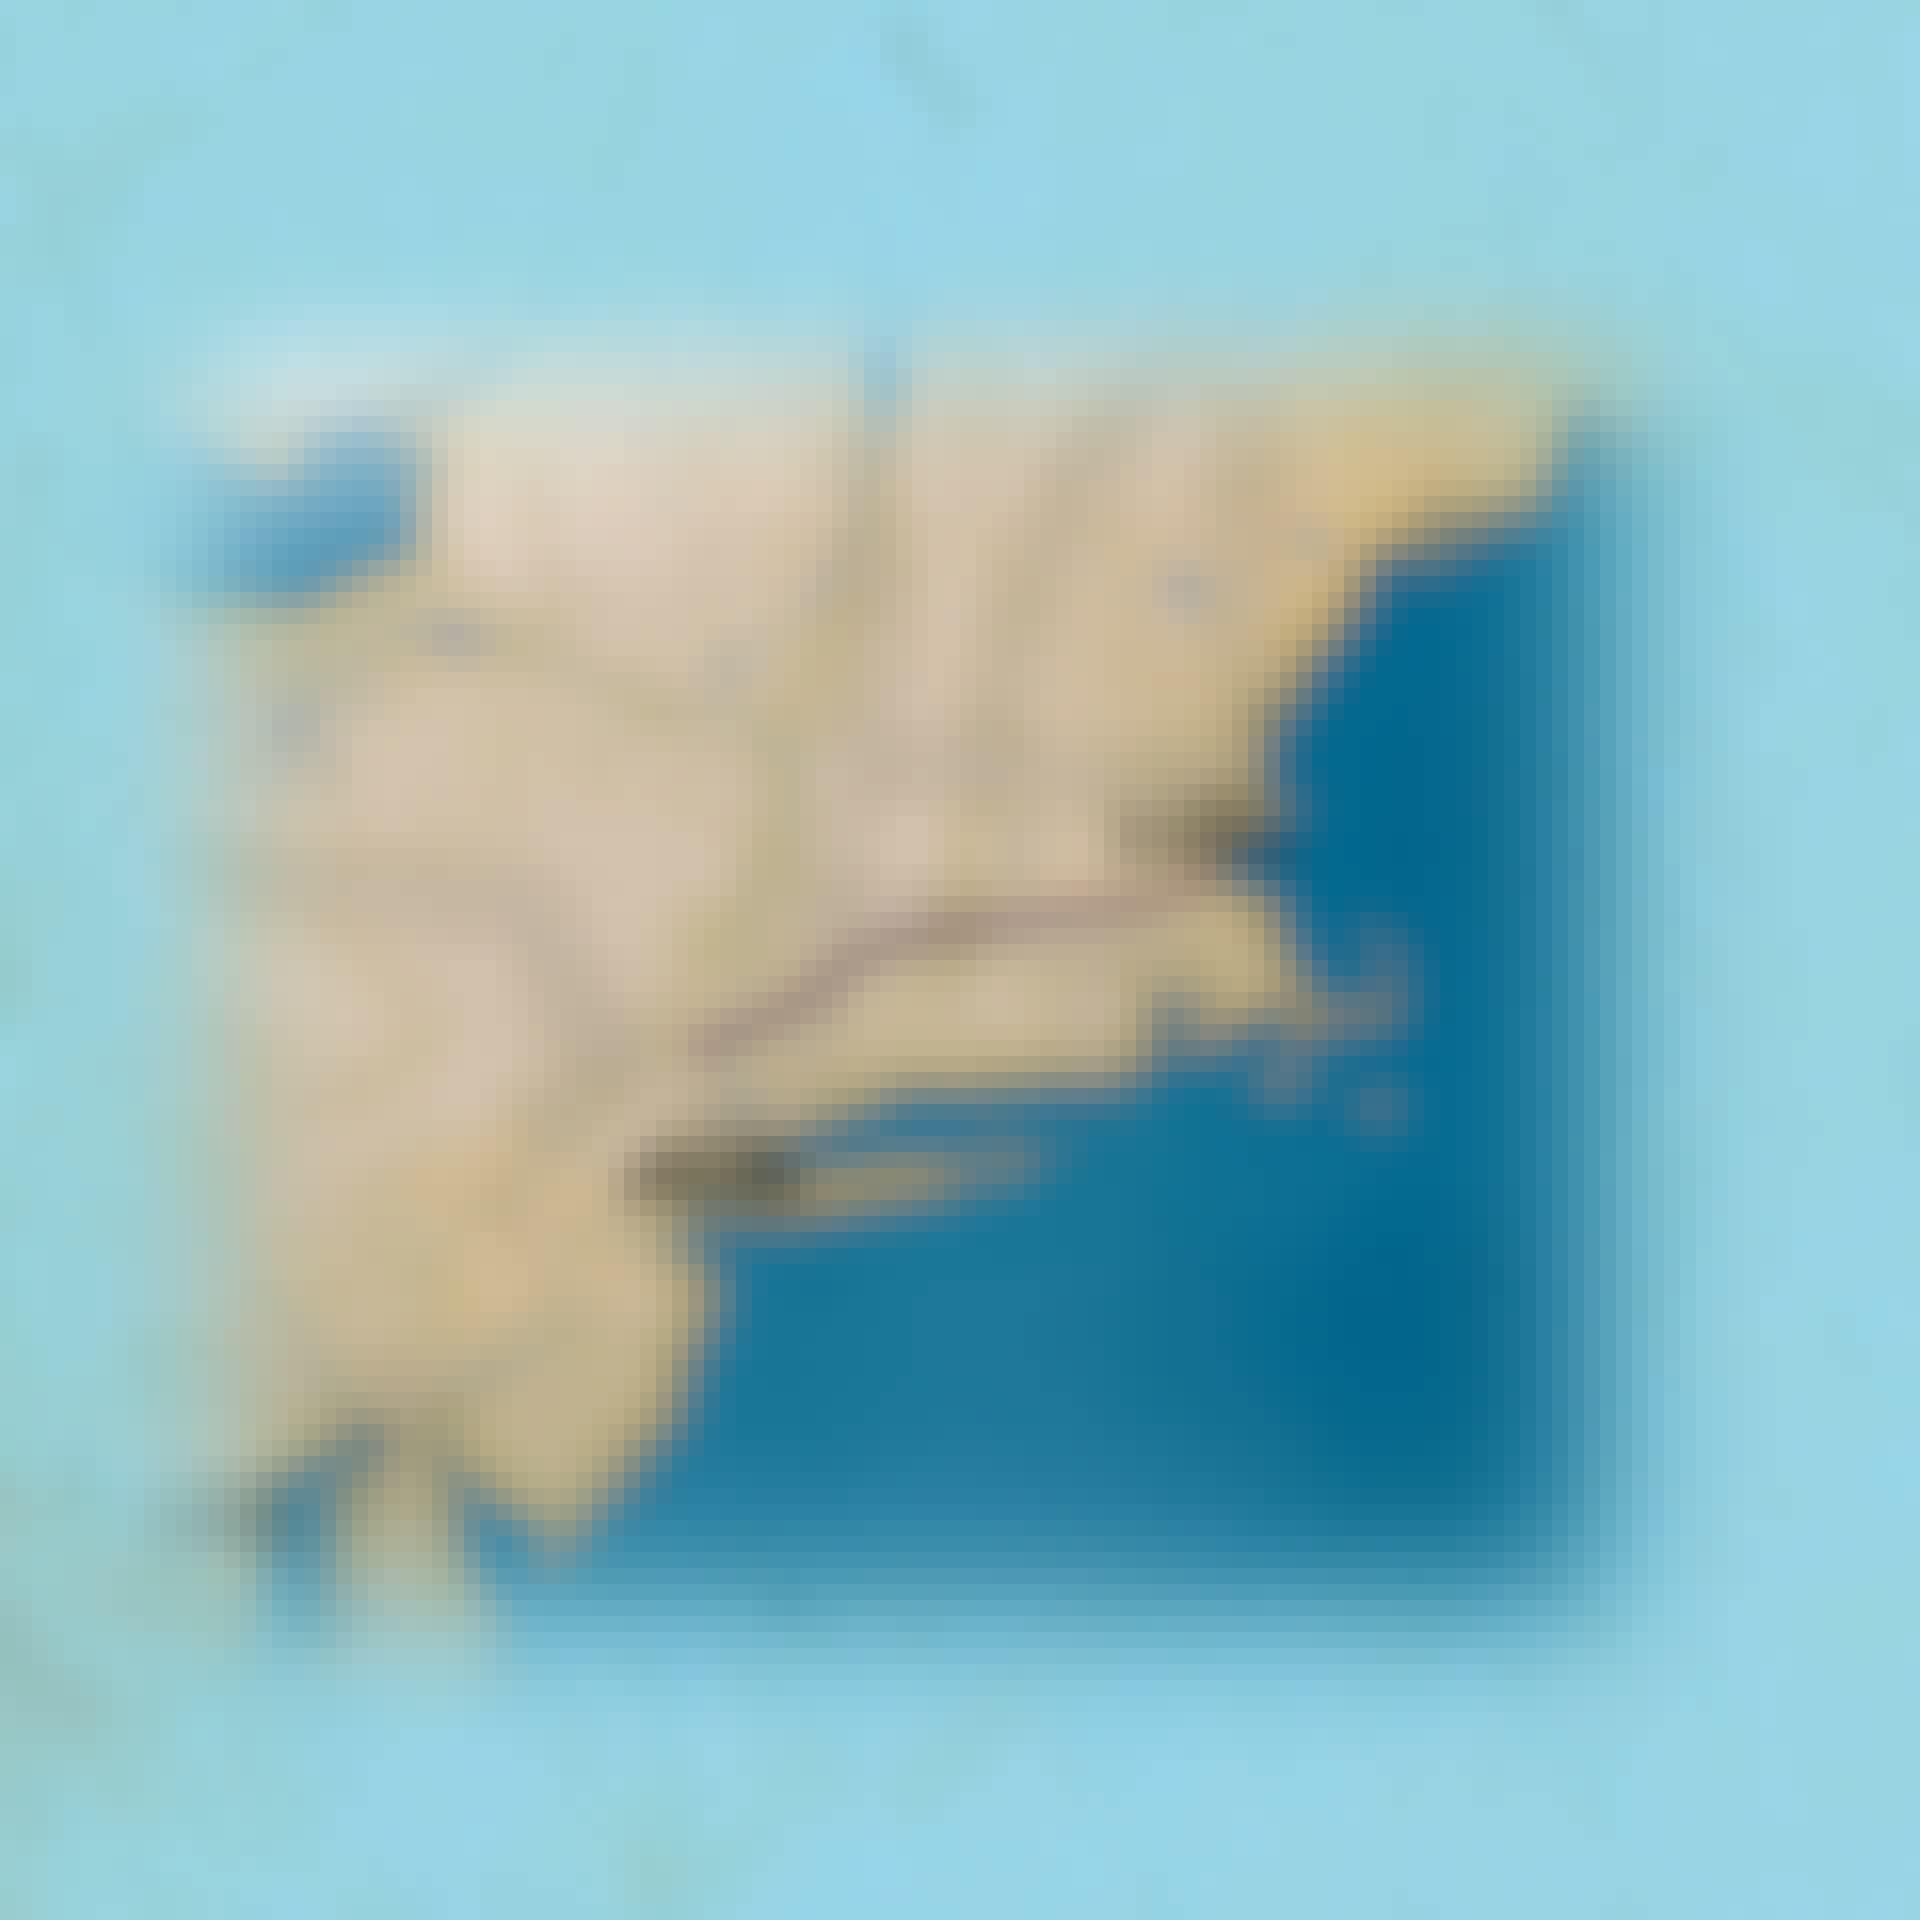 Kort over Flight 175s rute mod sydtårnet